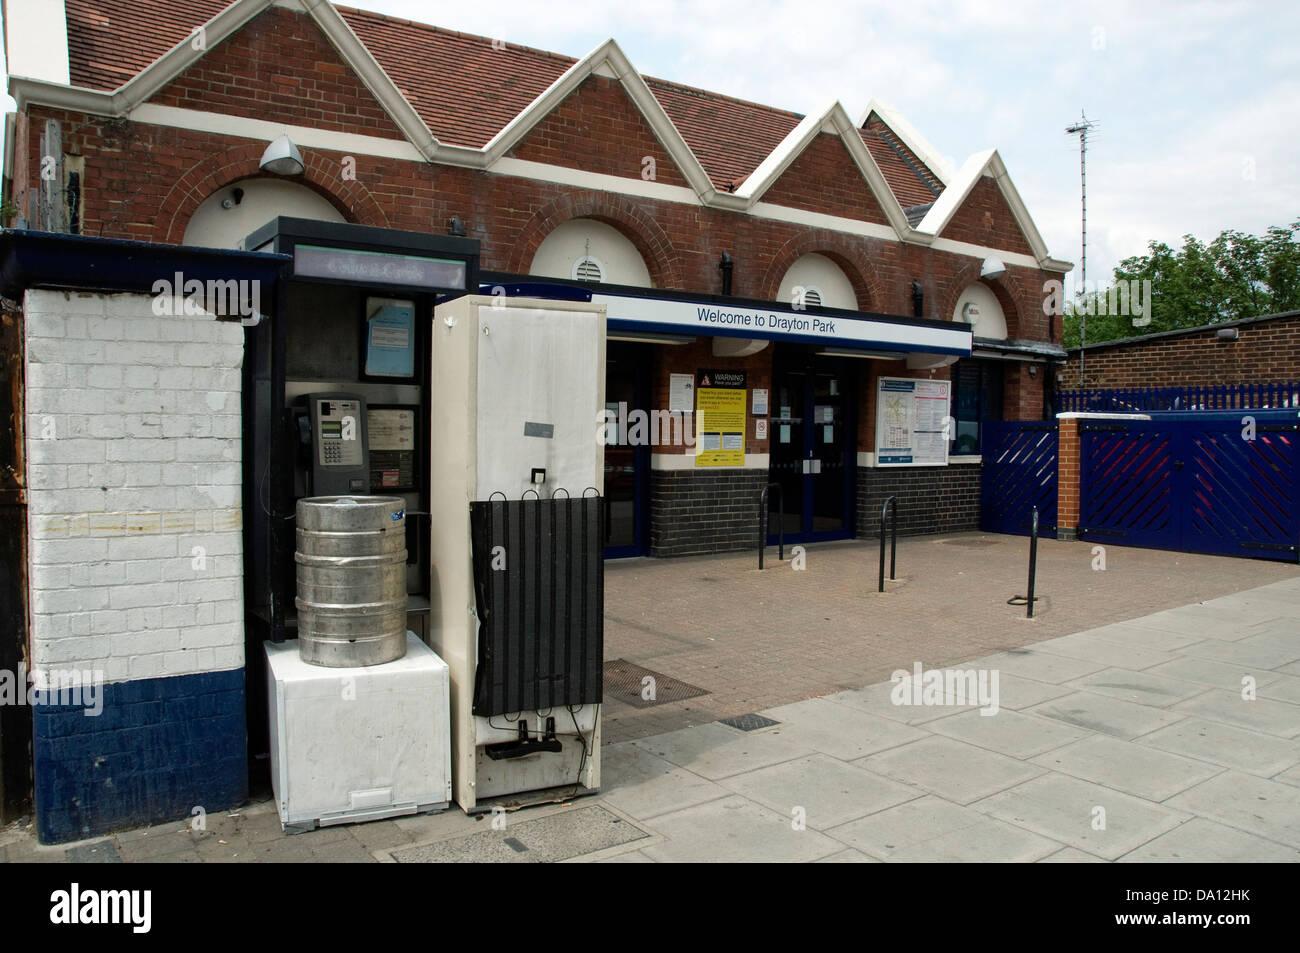 Old household appliances blocking the entrance to a public telephone box outside Drayton Park Station, Islington - Stock Image